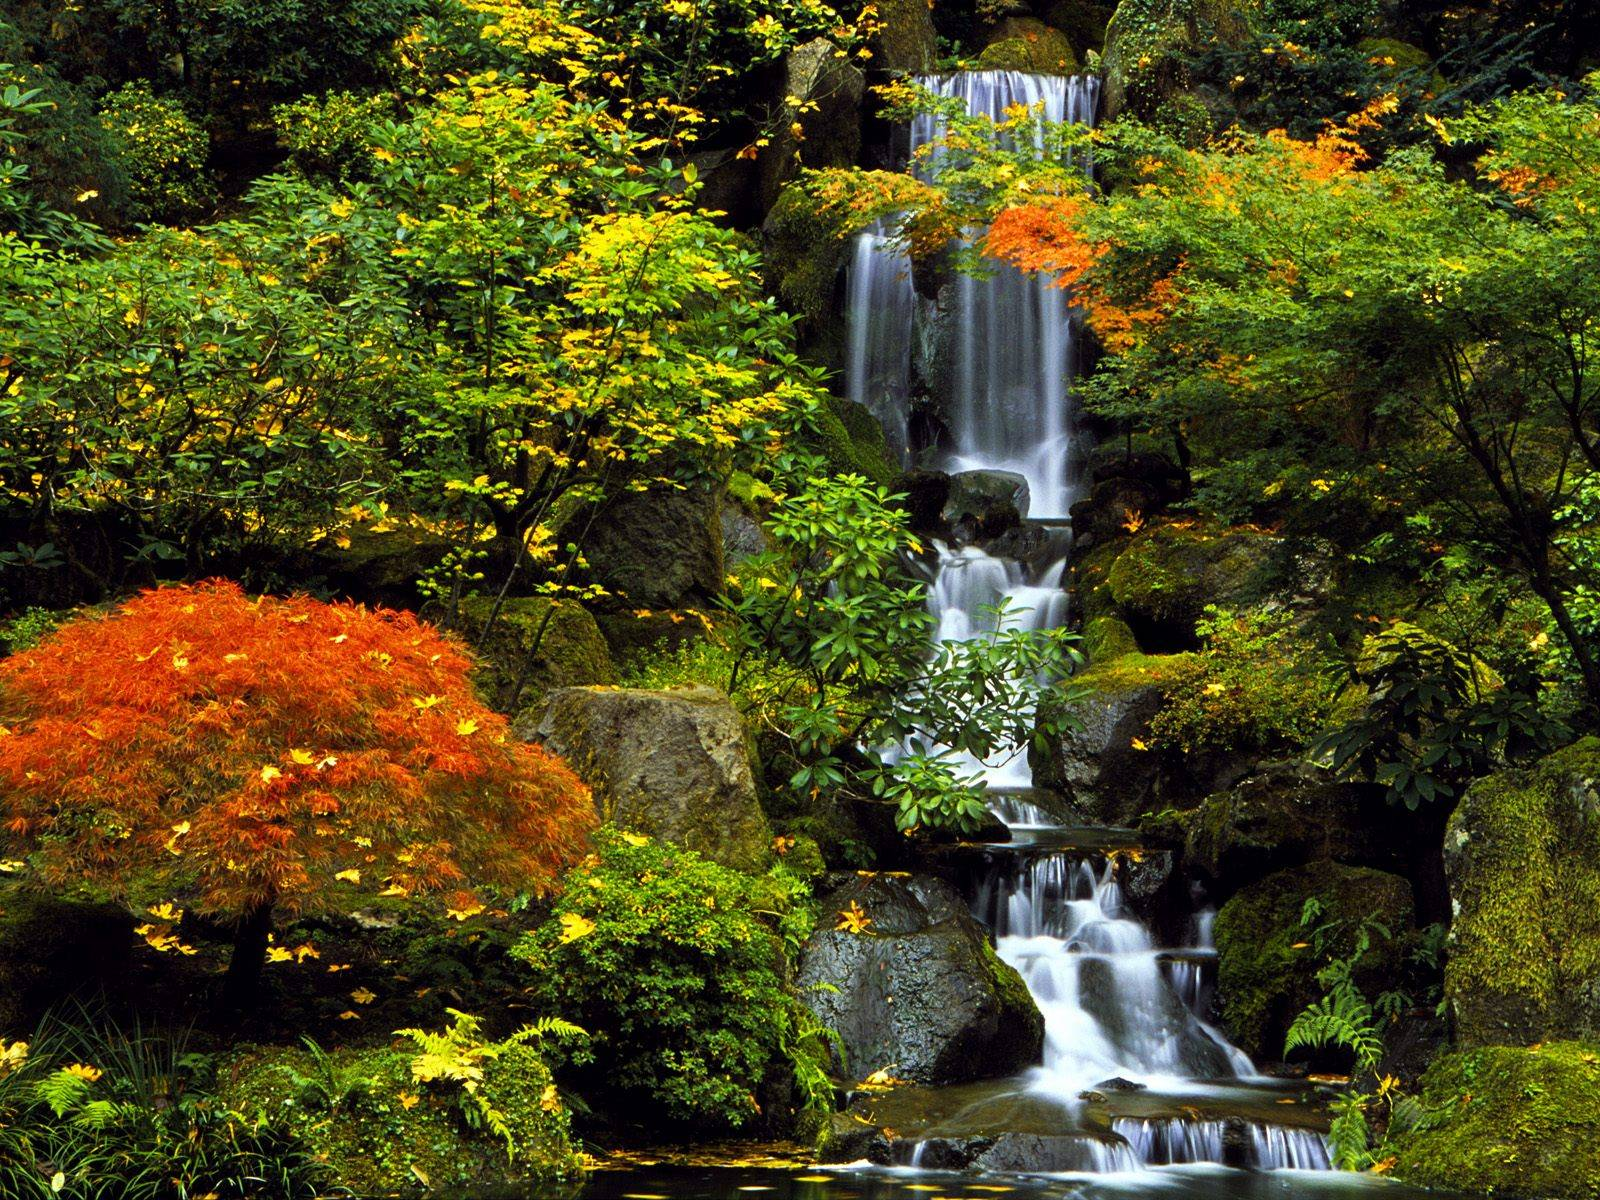 http://grandcanyon.free.fr/images/cascade/original/Japanese%20Garden,%20Portland,%20Oregon.jpg